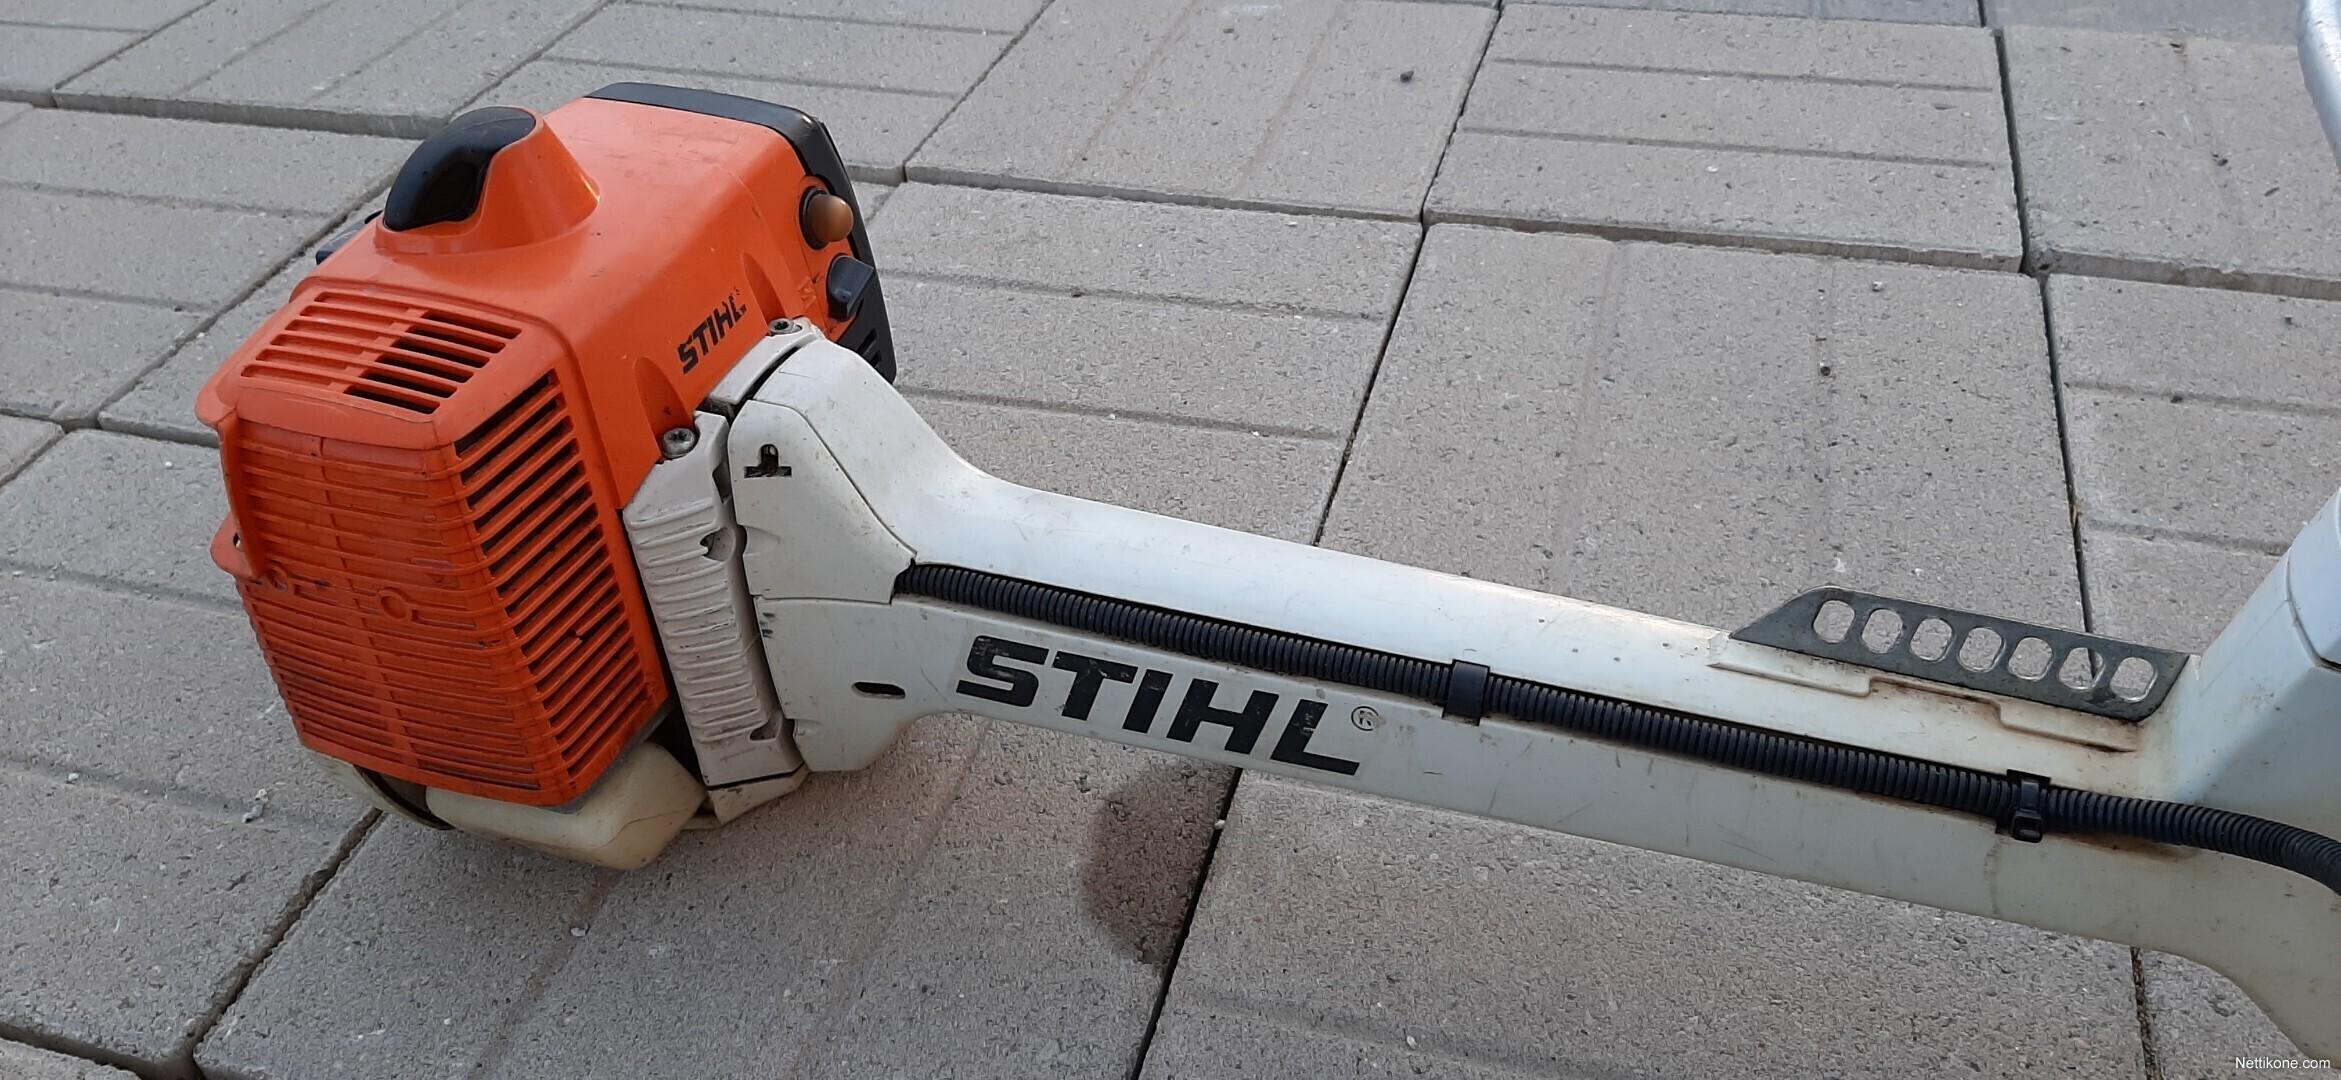 Stihl Fs 450 Tekniset Tiedot